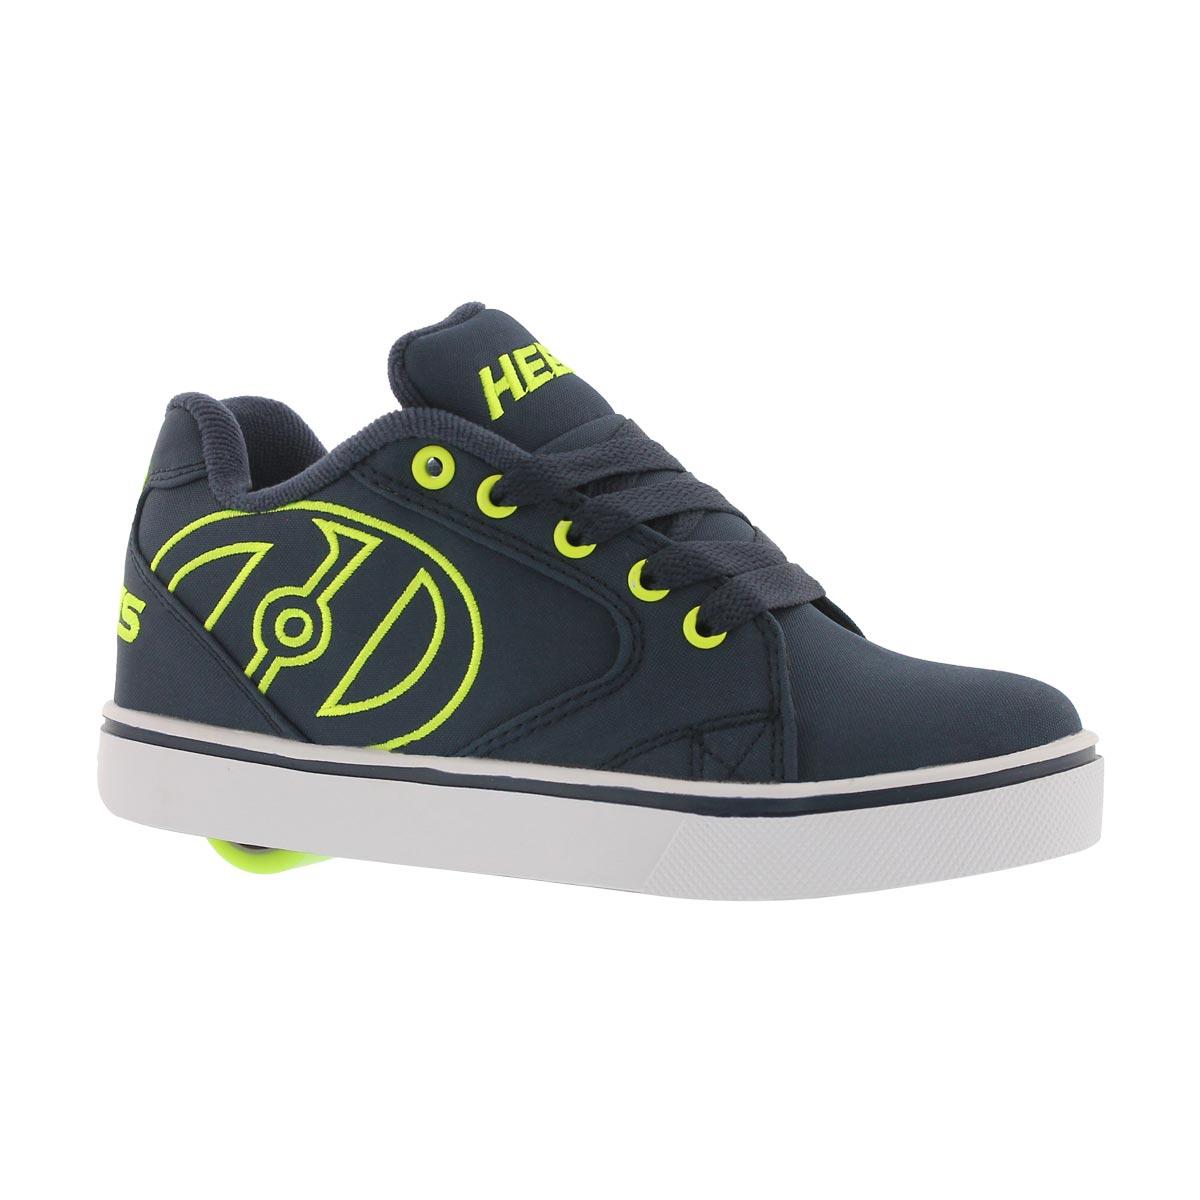 Boys Vopel Navy Bright Yellow Skate Sneakers